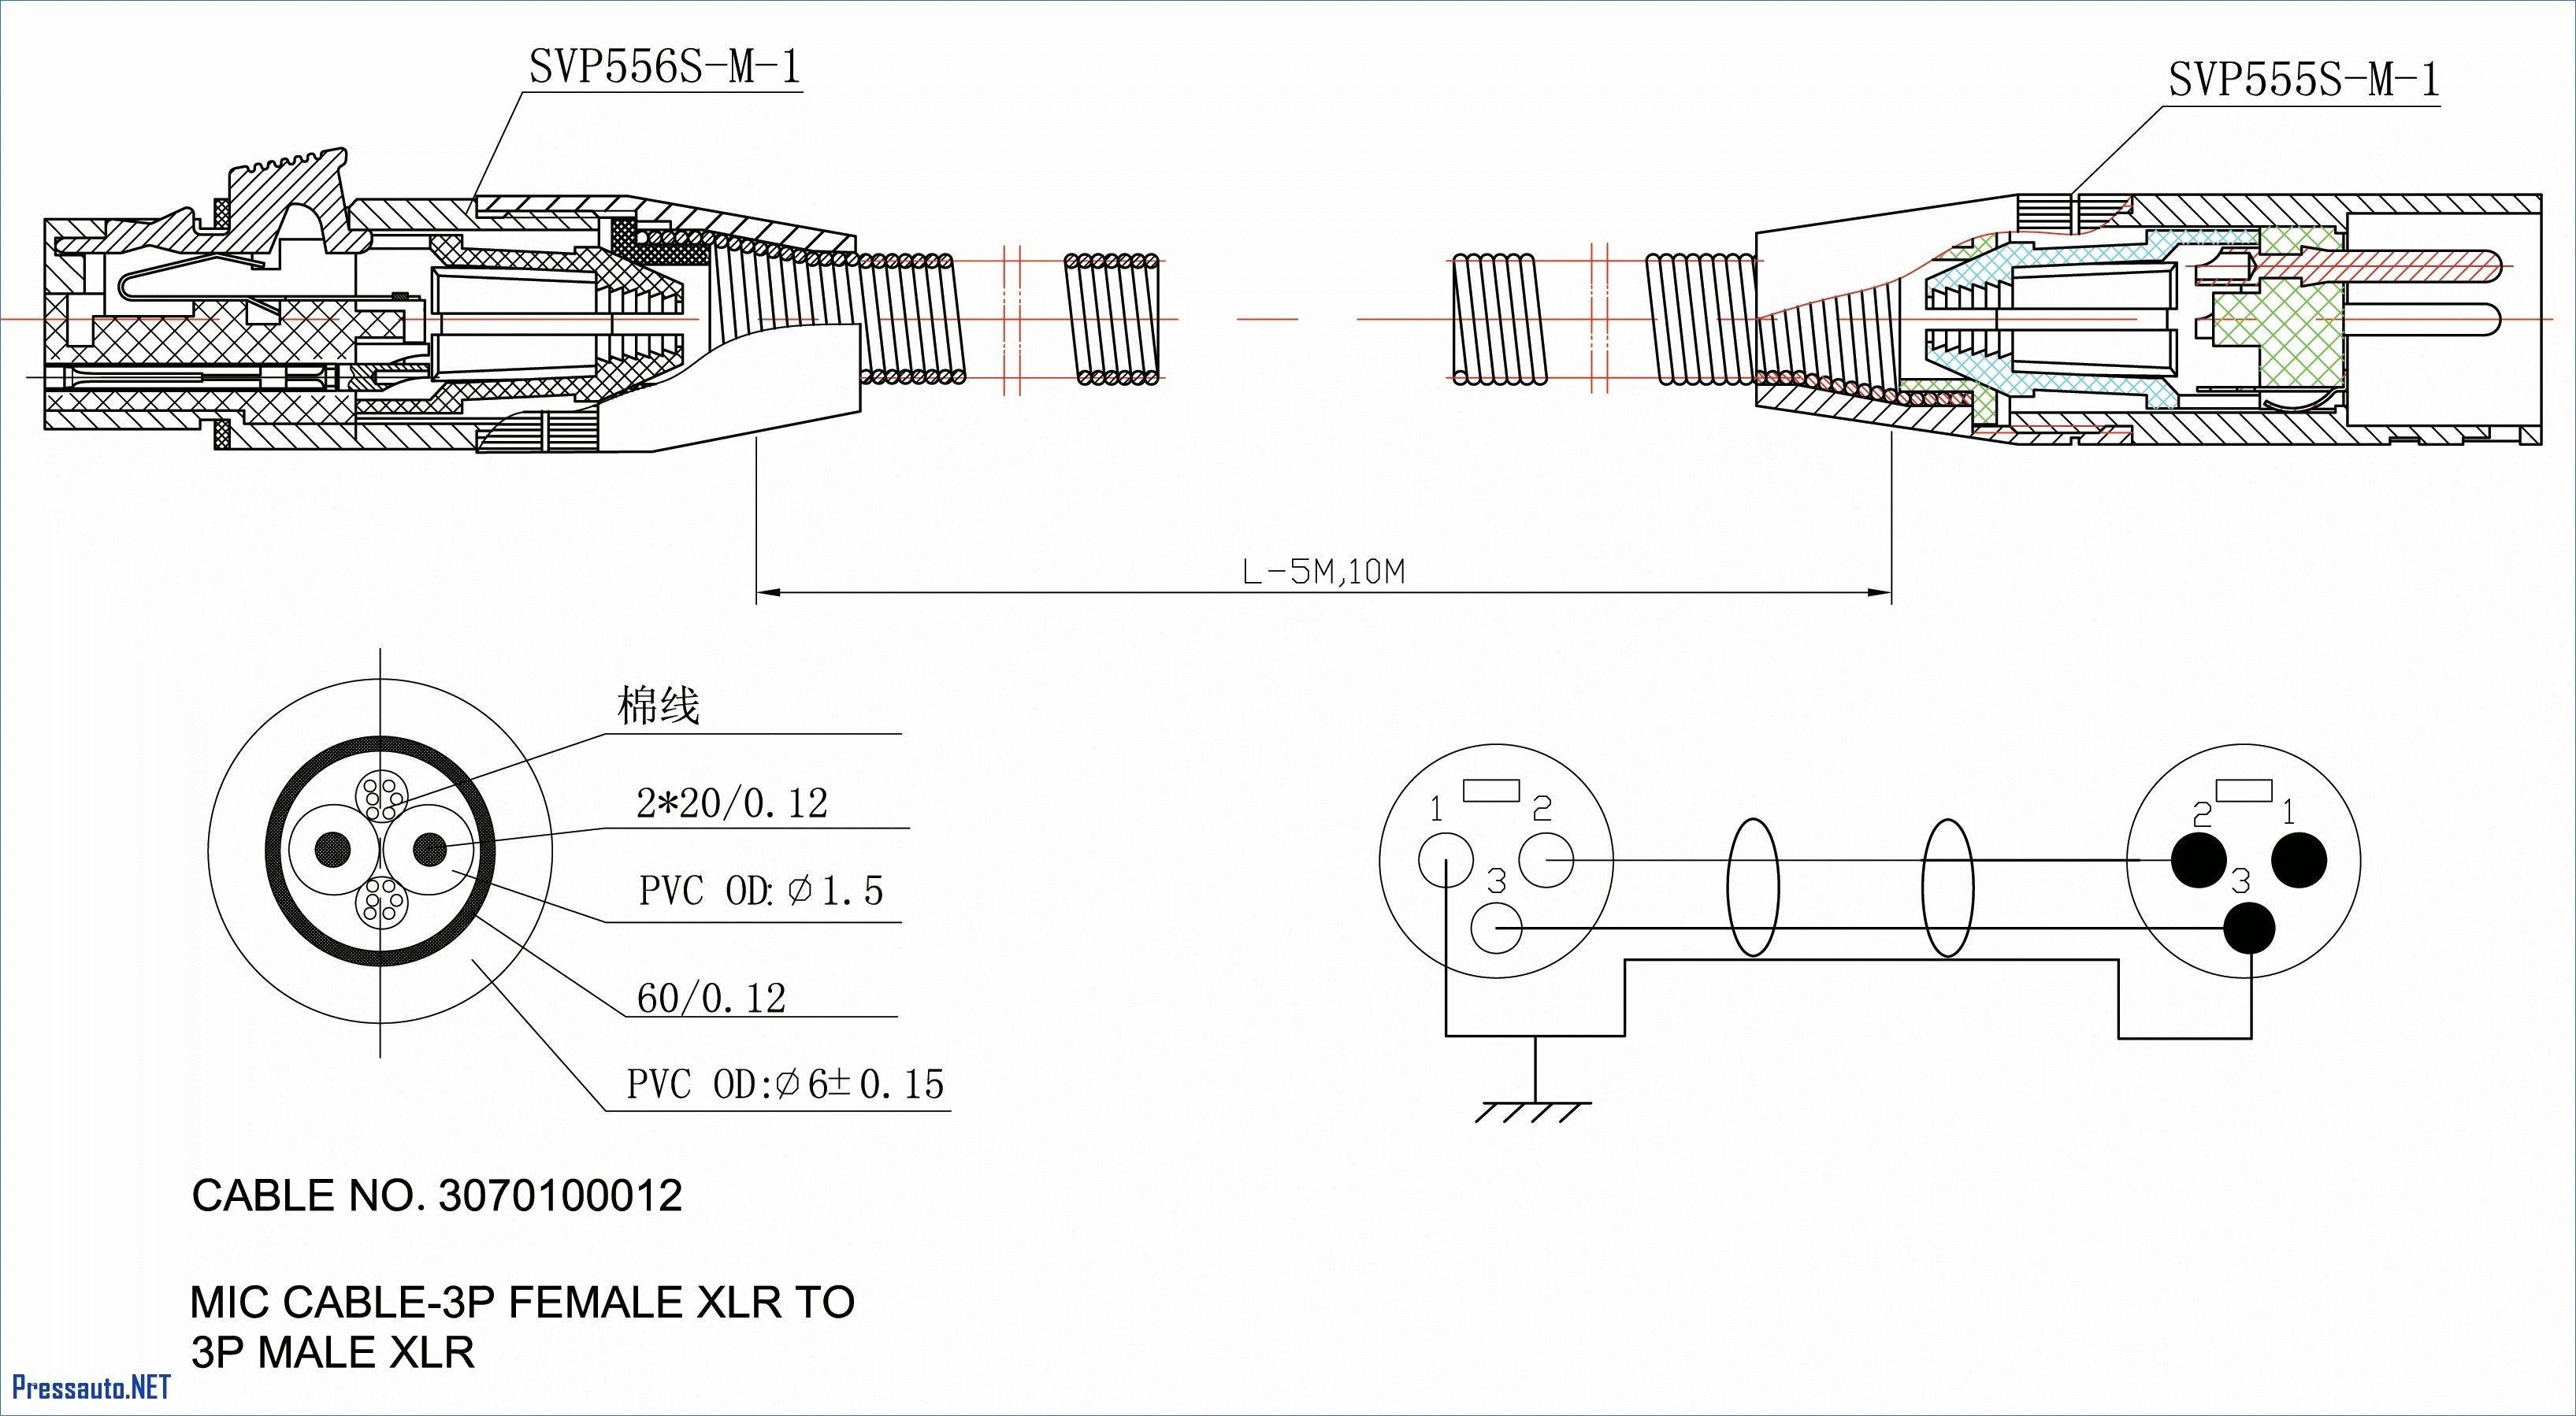 Nd80pdeu Spa 626 Wiring Diagram